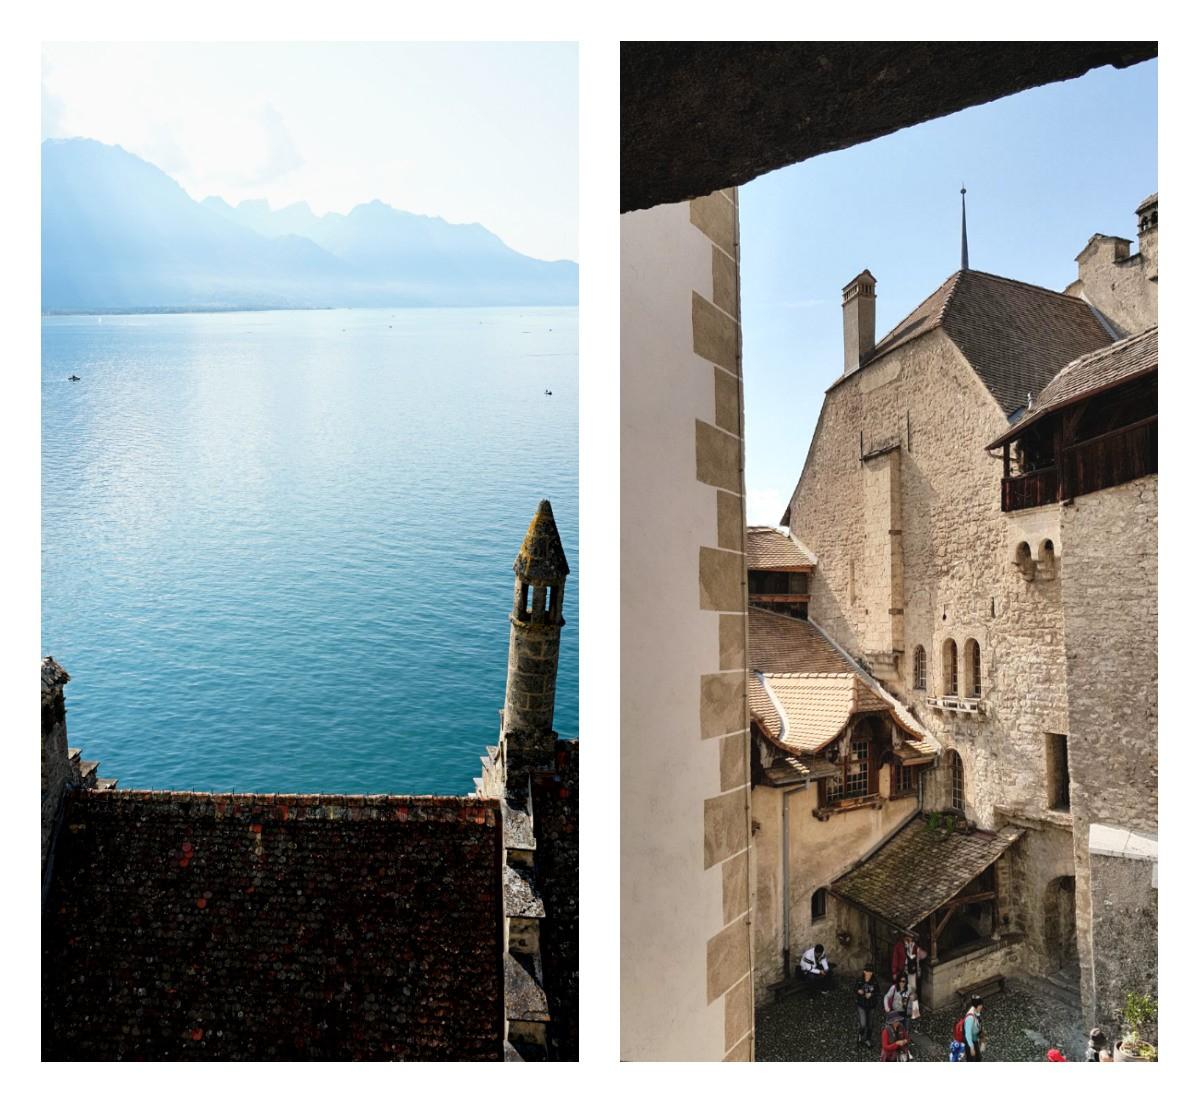 castelos suiça château de chillon